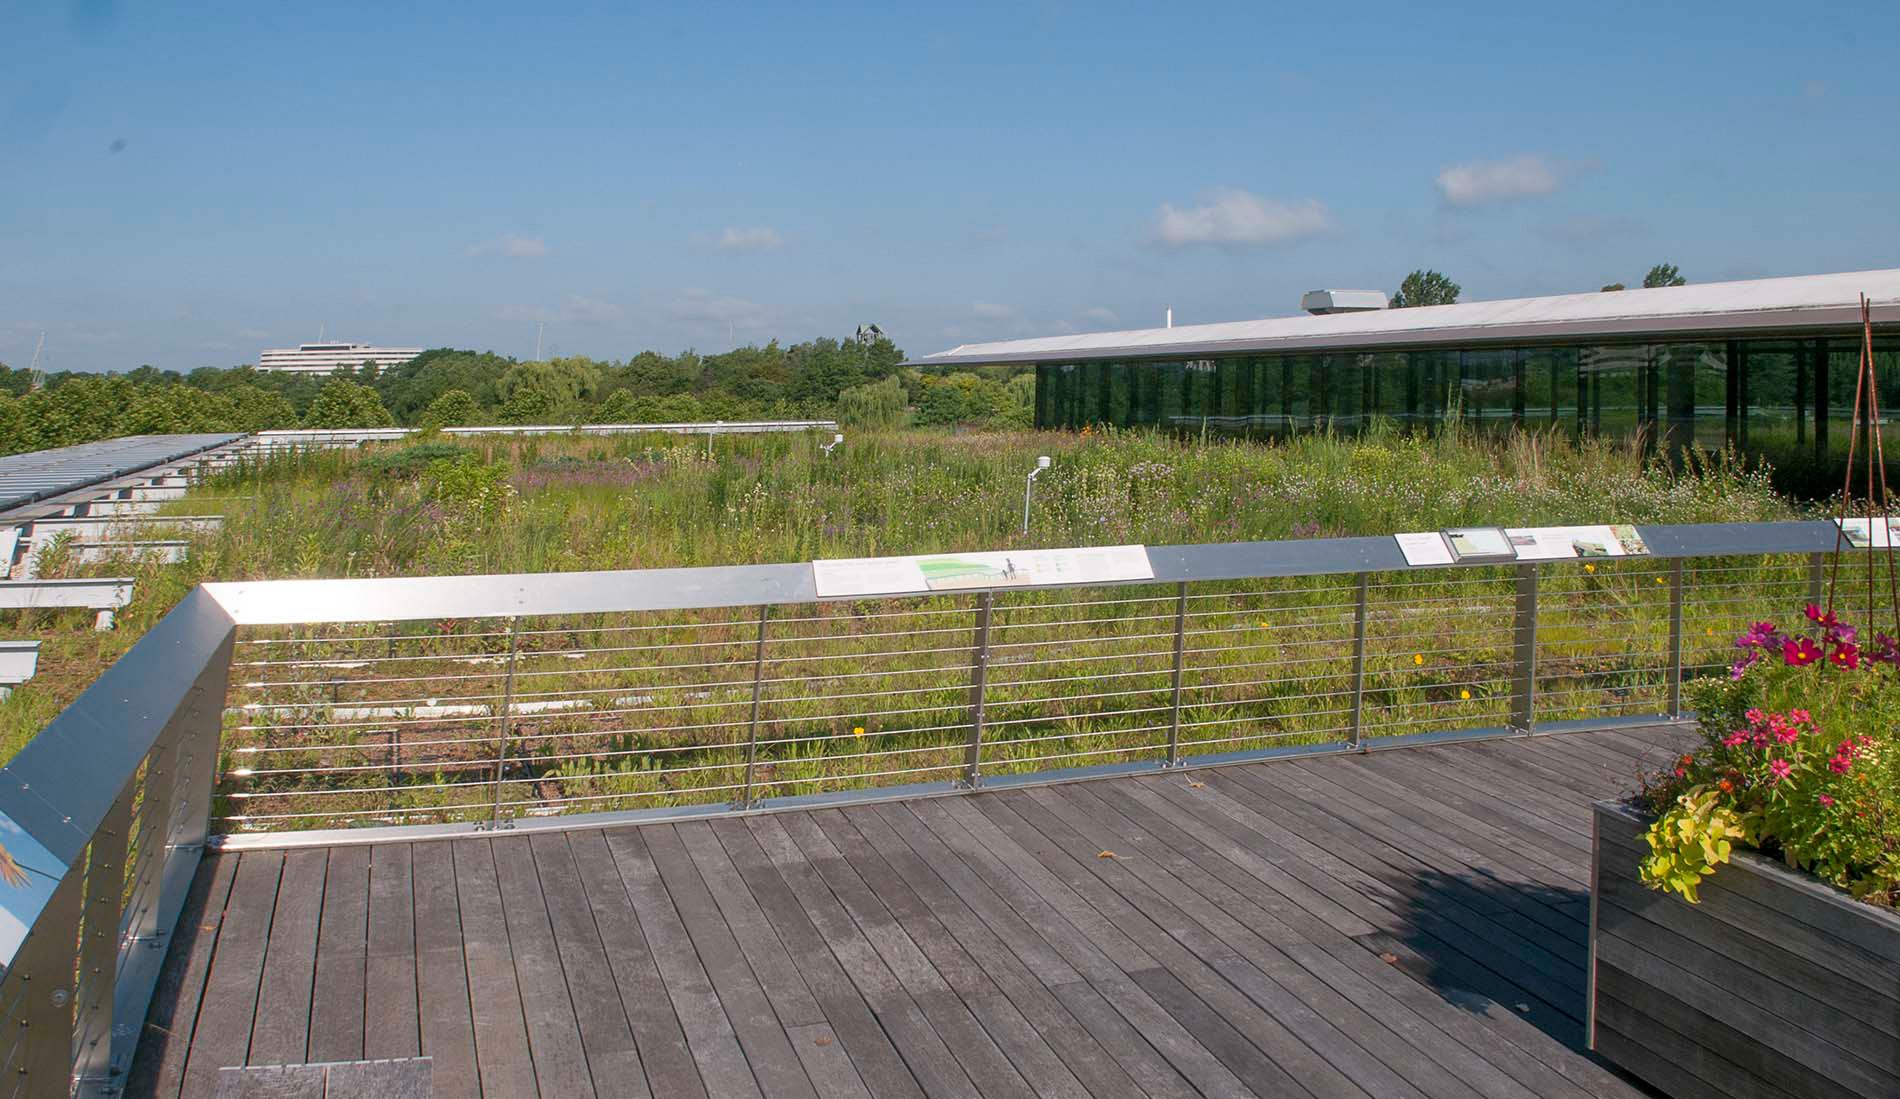 Chicago Botanic Garden green roof-South